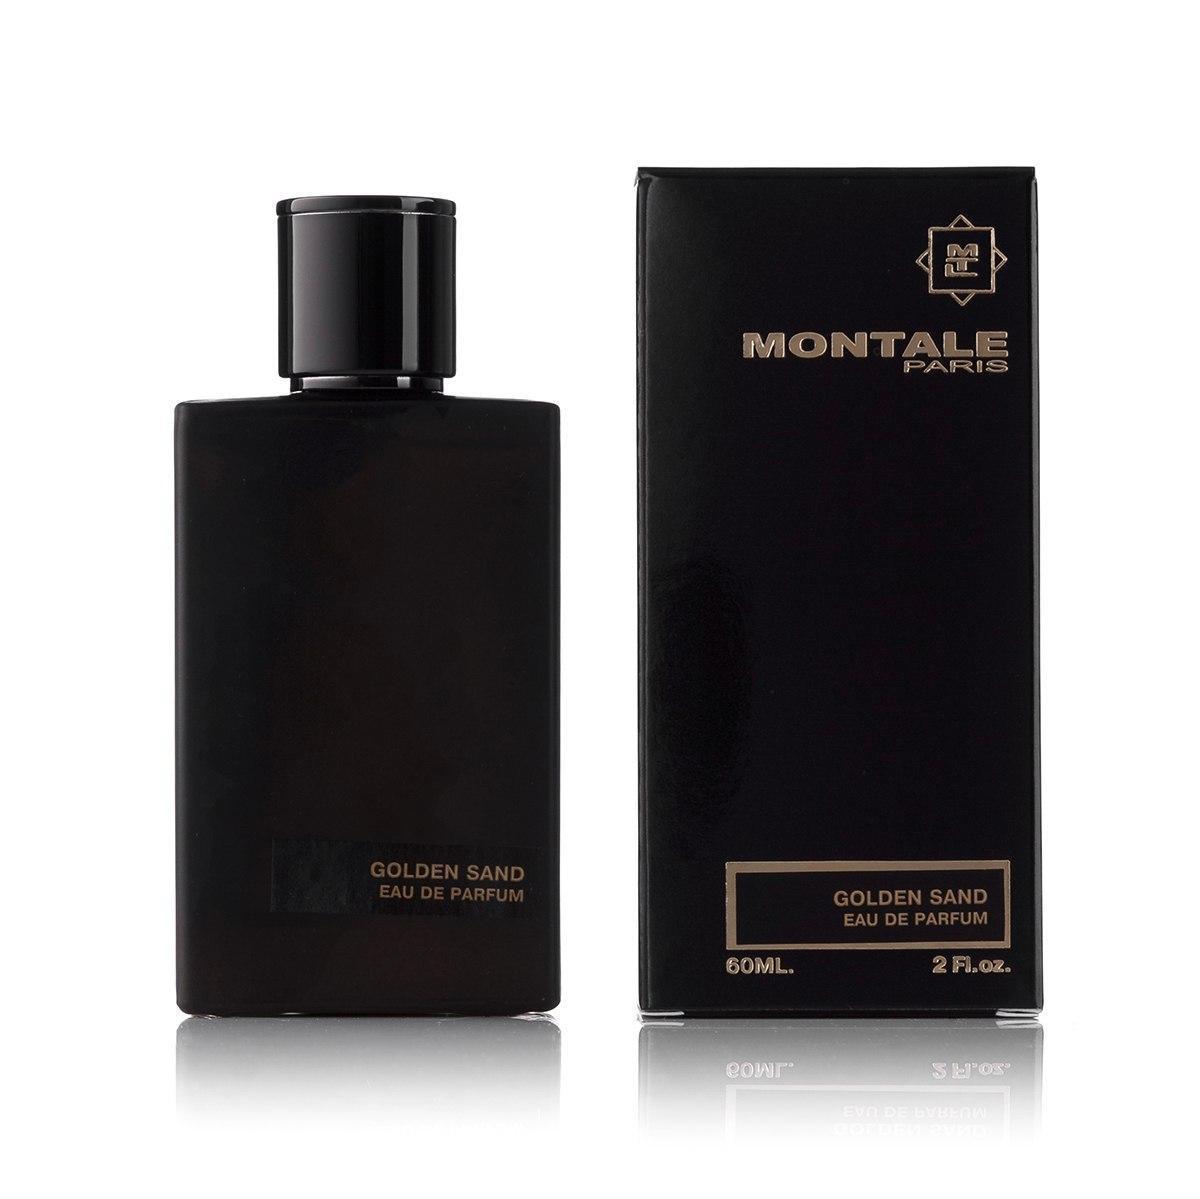 60 ml Міні парфум Montale Golden Sand (унісекс) - M-15